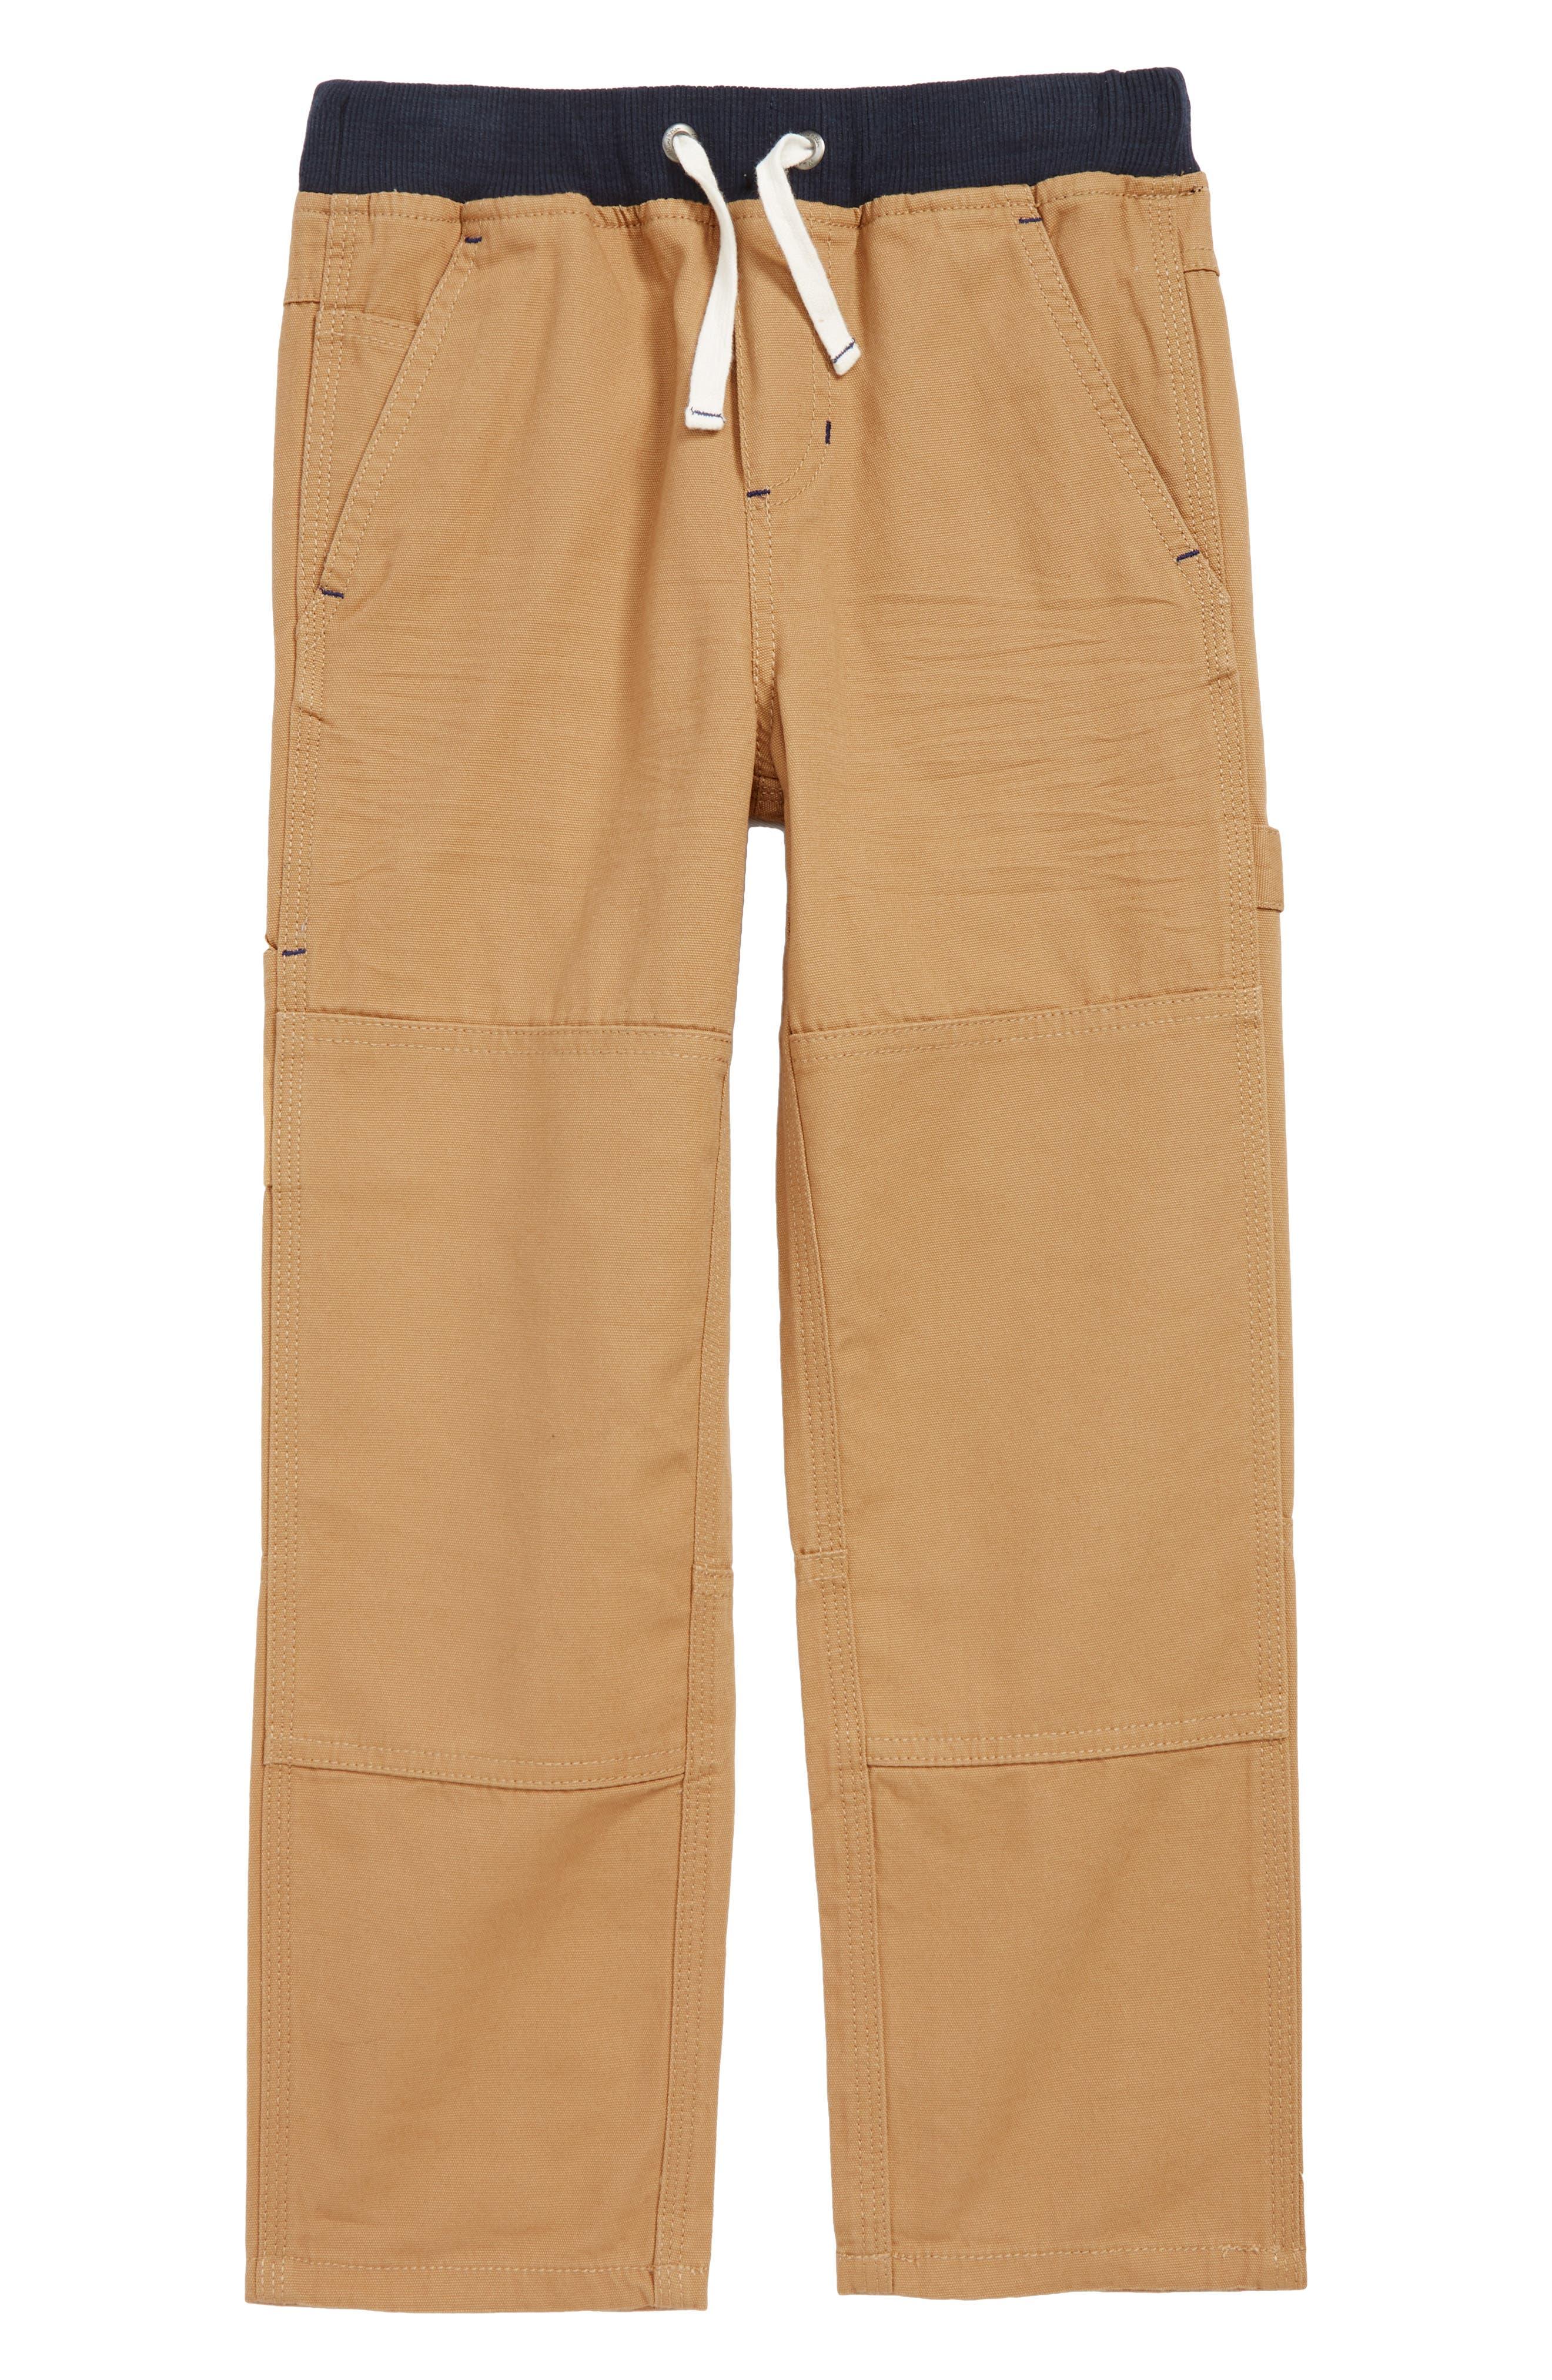 Toddler Boys Mini Boden Rib Waist Carpenter Pants Size 3Y  Brown